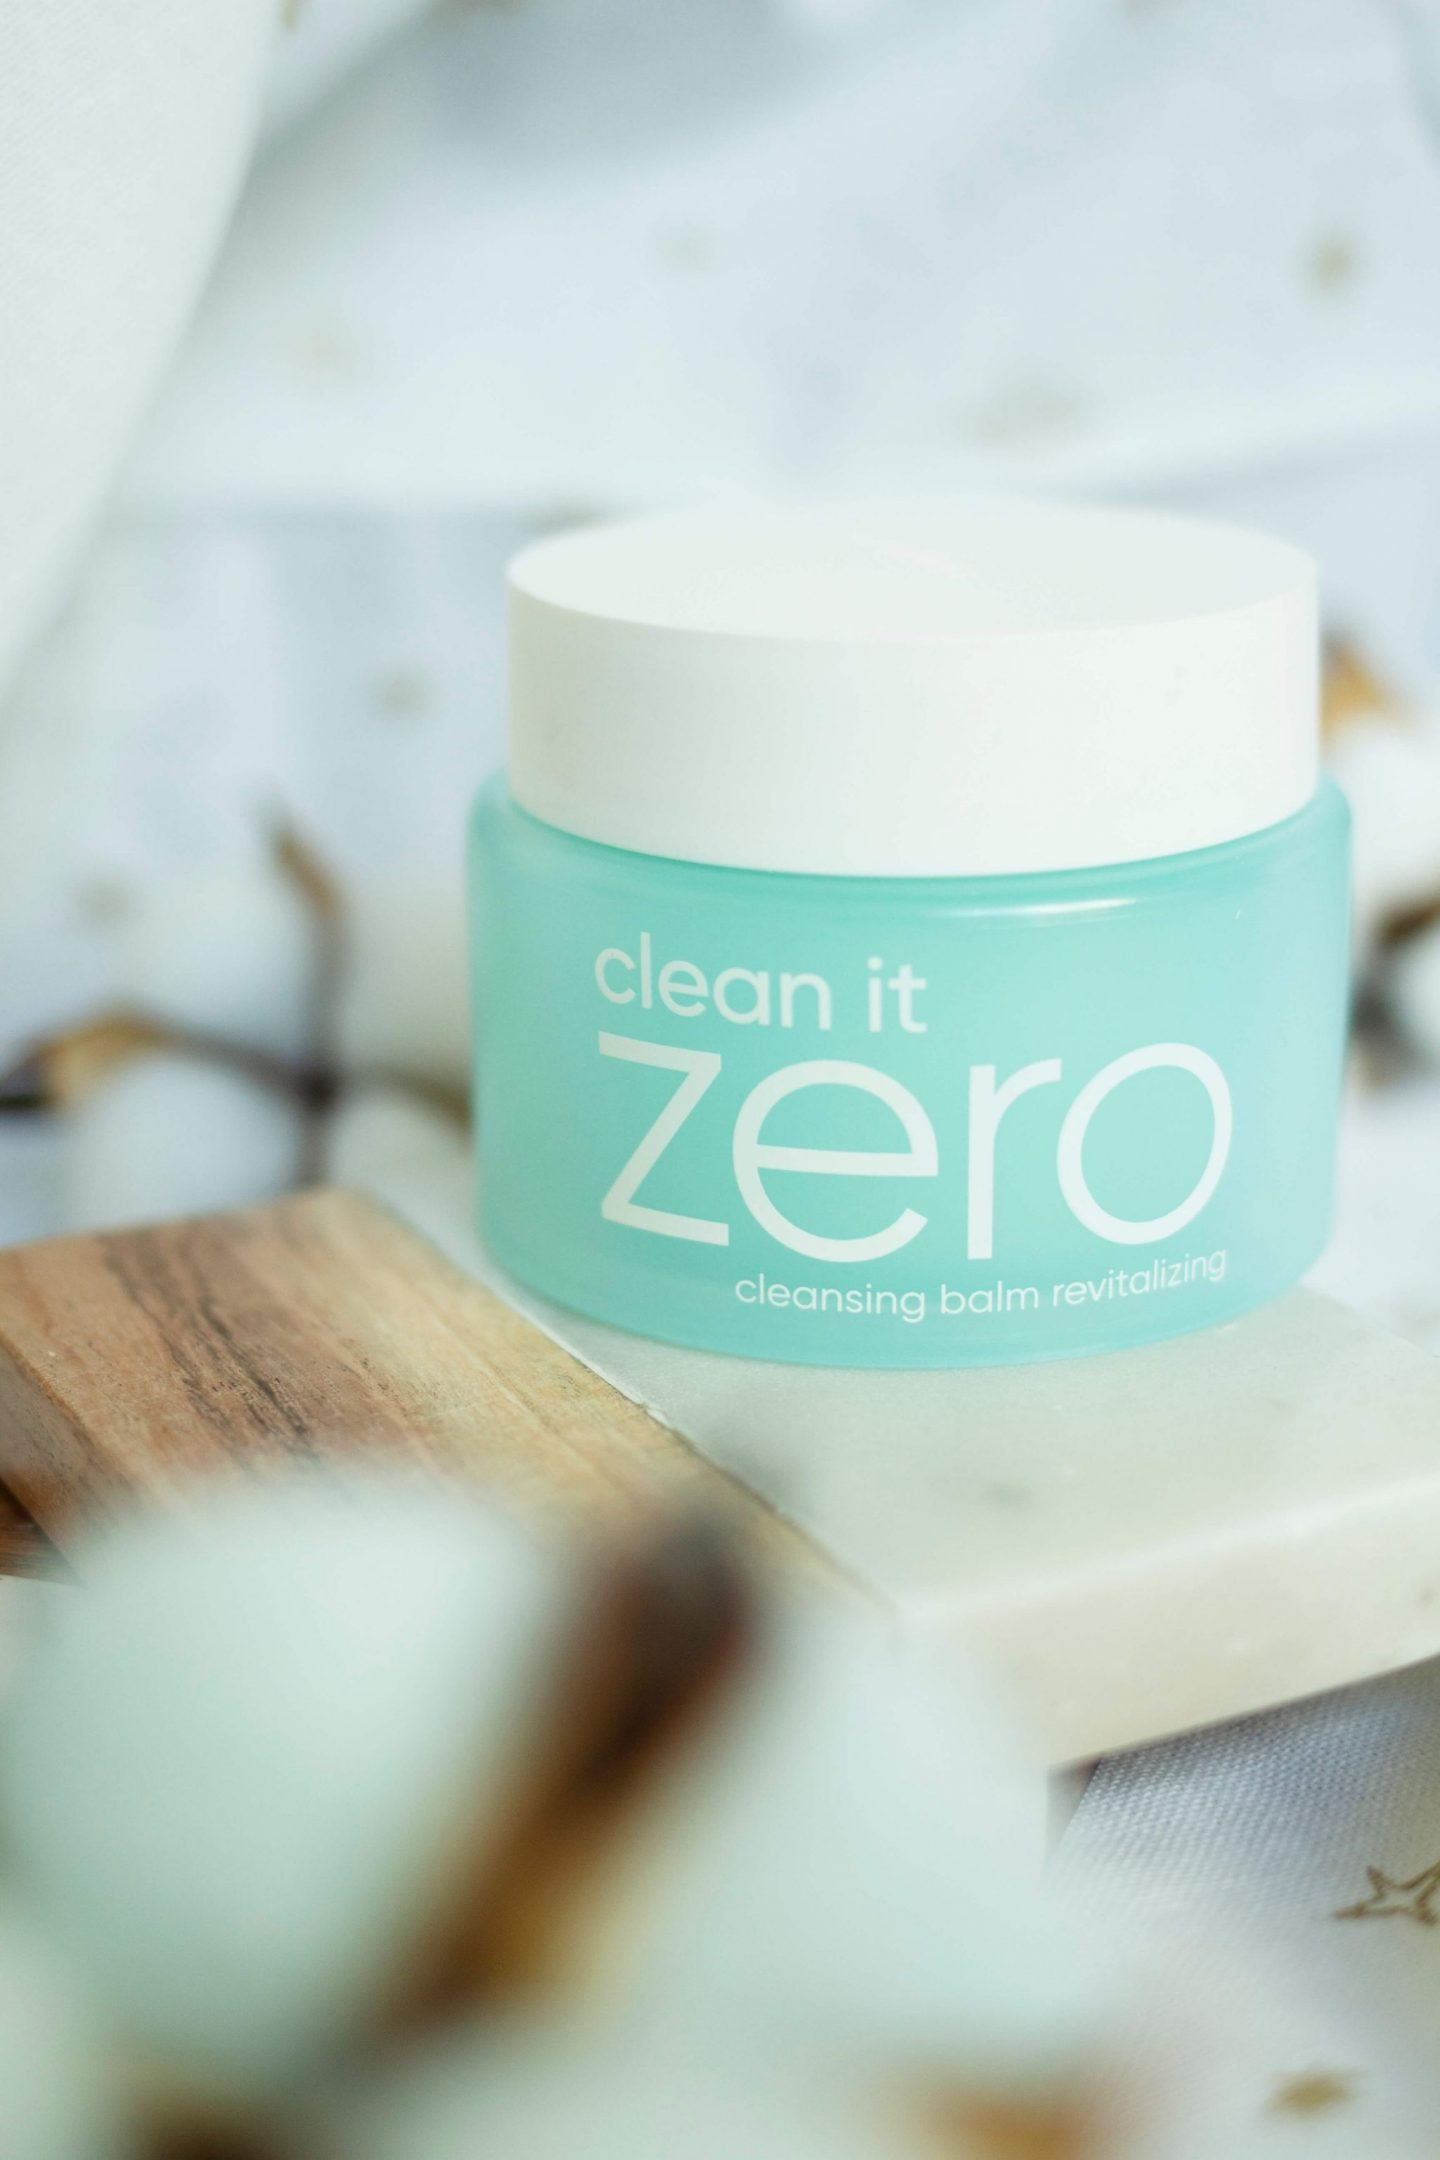 banilaco clean it zero revitalizing cleansing balm